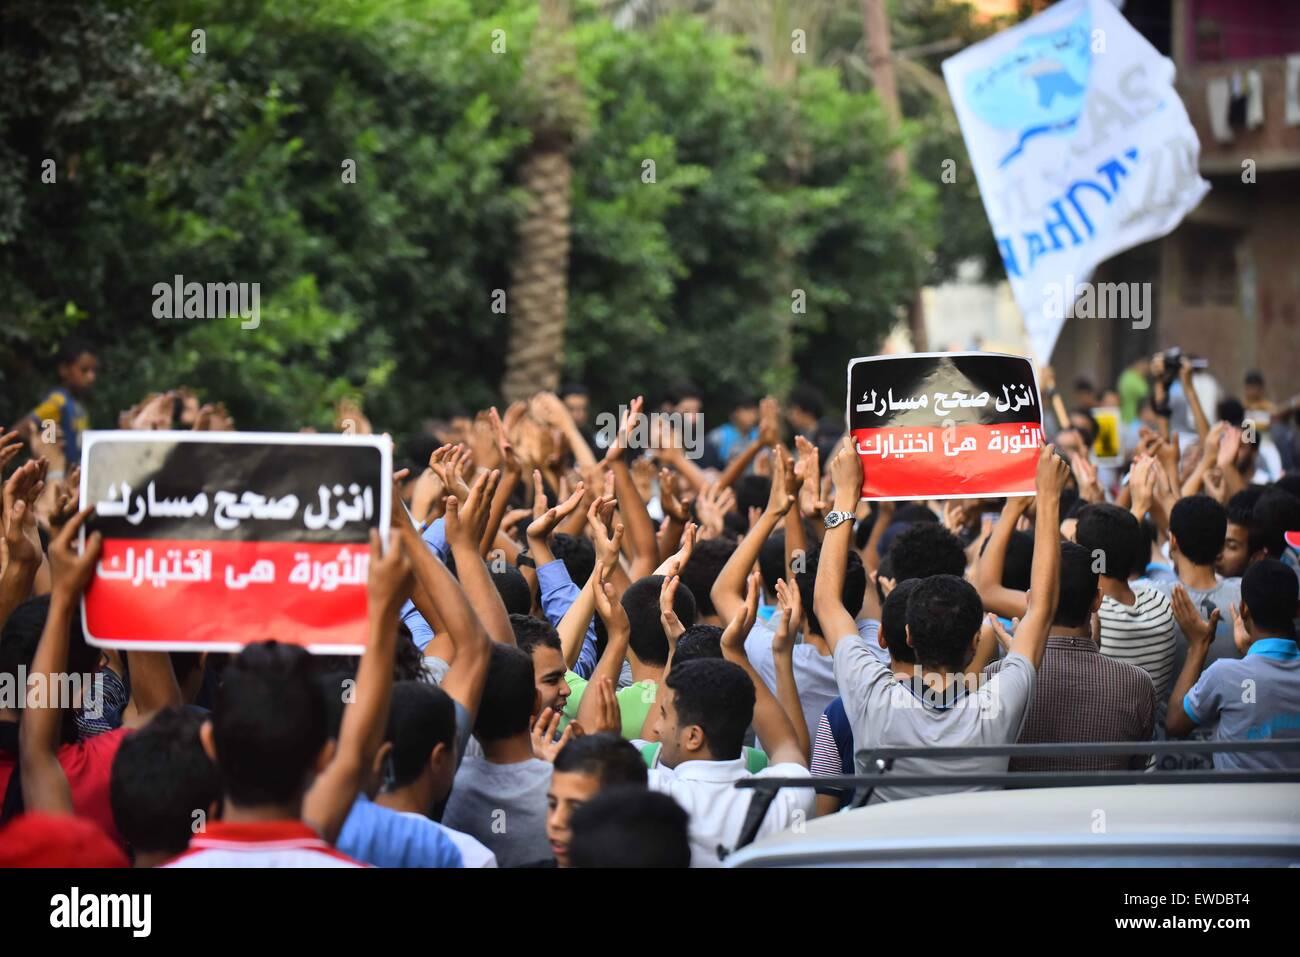 Cairo, Egypt  9th Mar, 2014  Members of Ultras Nahdawy group